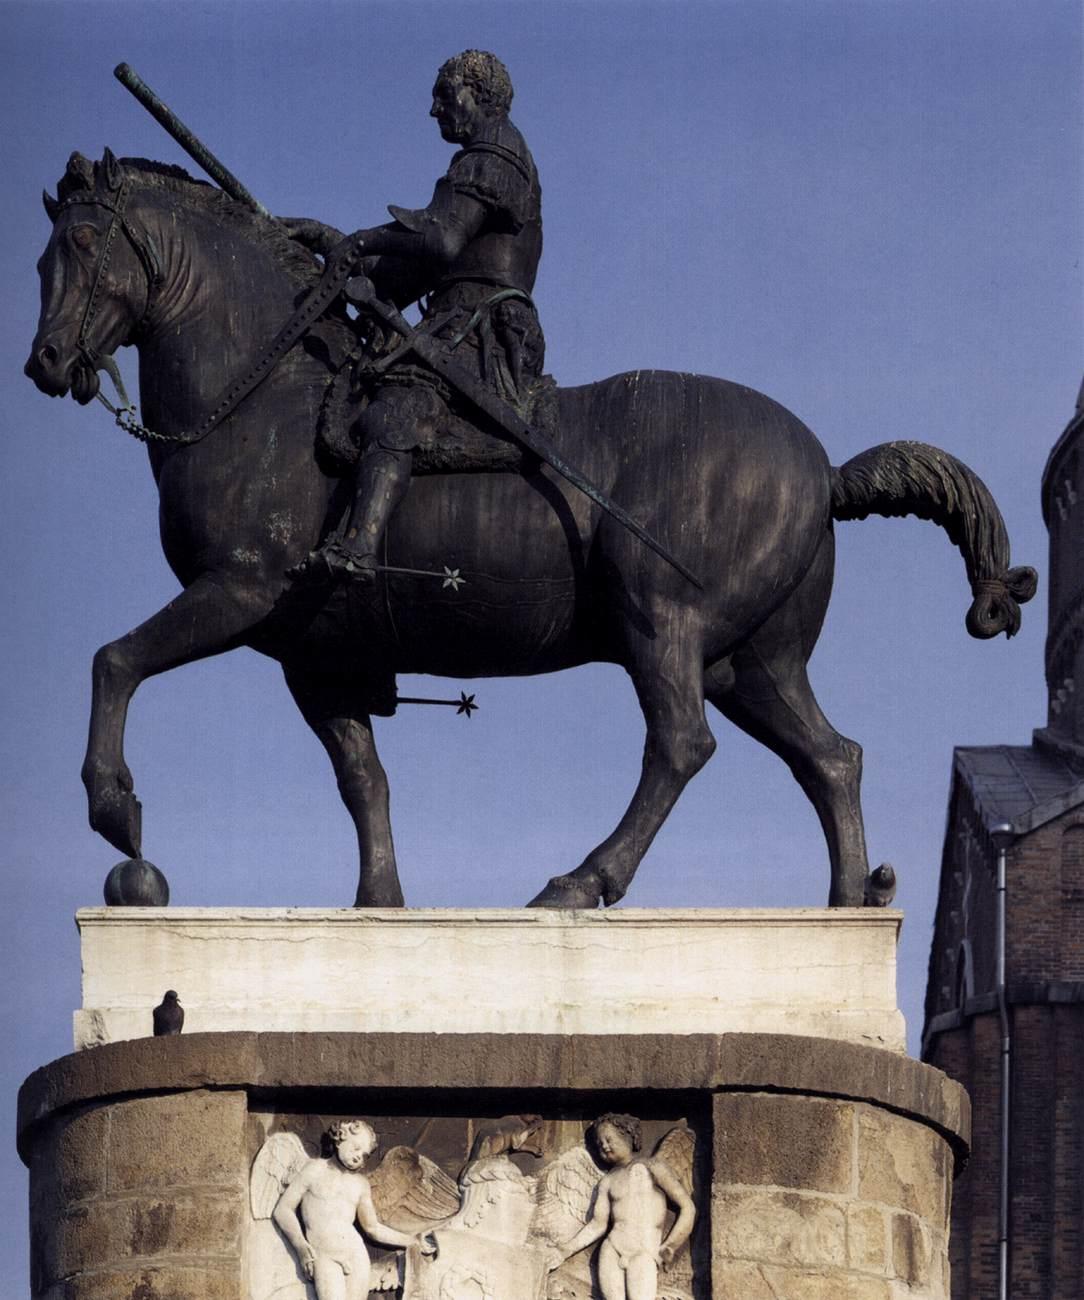 DONATELLO  Equestrian Statue of Gattamelata  1447-50  Piazza del Santo    Donatello Equestrian Statue Of Gattamelata